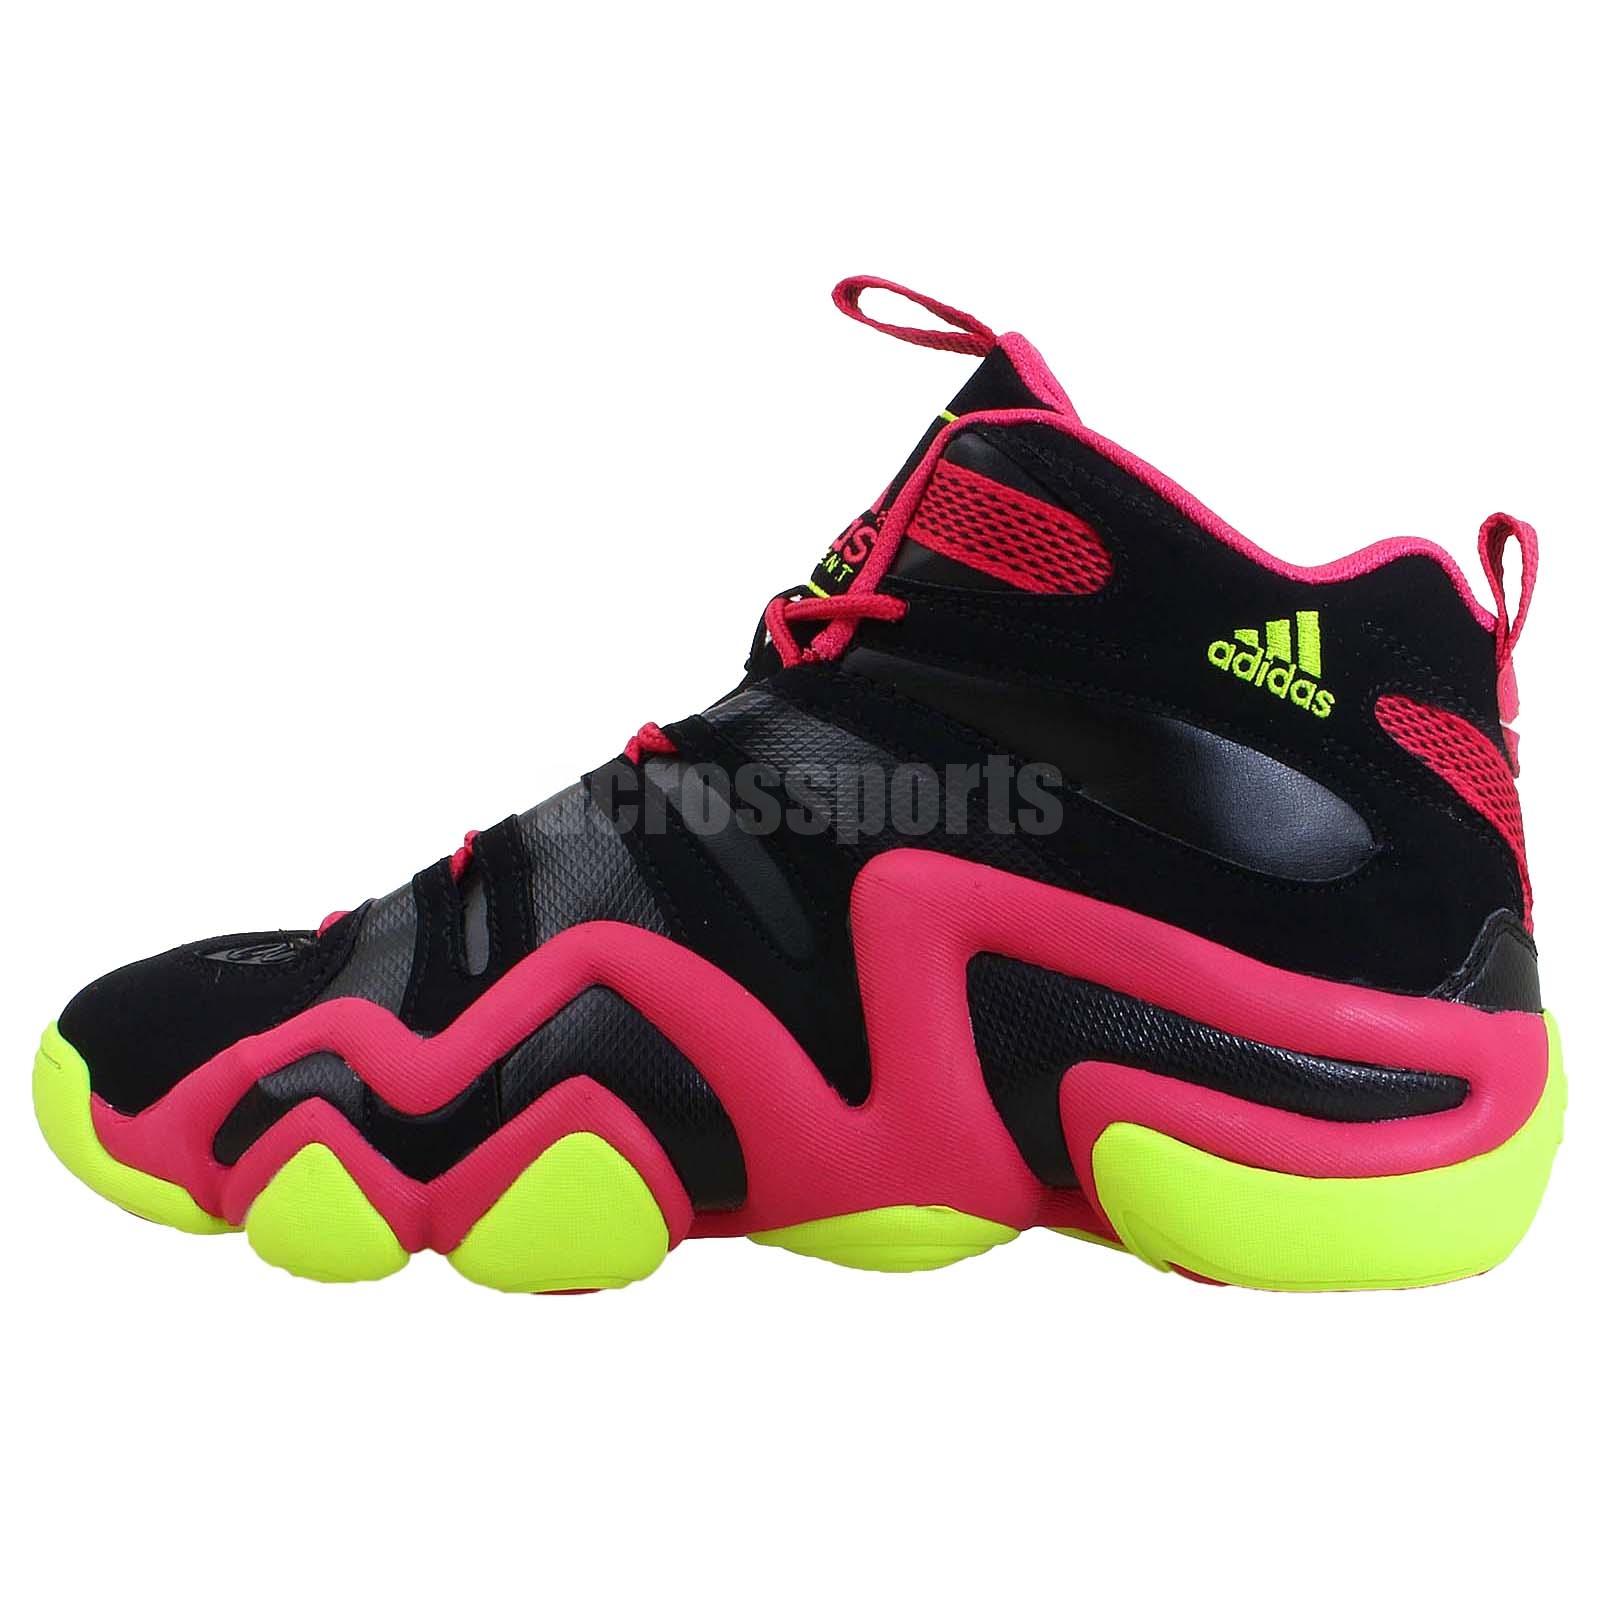 sale retailer 4cd68 5196d Details about Adidas Crazy 8 Kobe Bryant I Love Mom Black Pink 2014